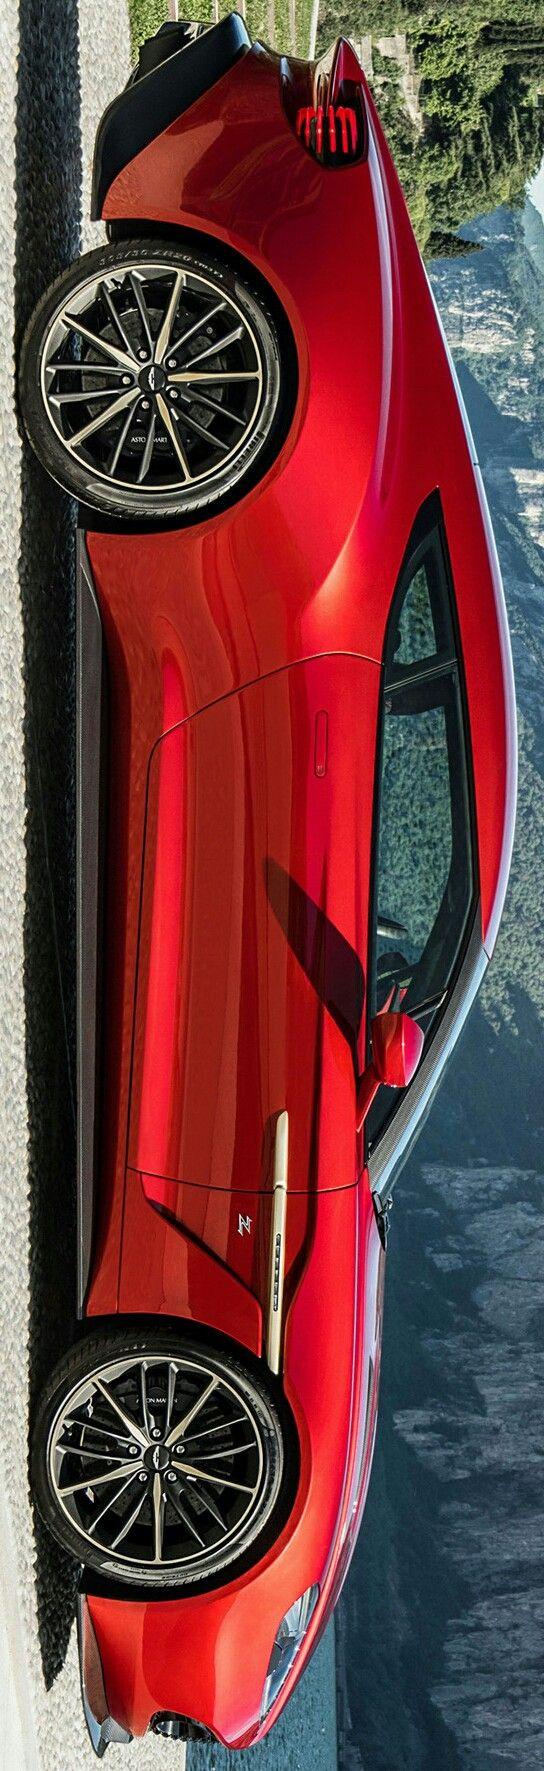 2016 Aston Martin Vanquish Zagato by Levon